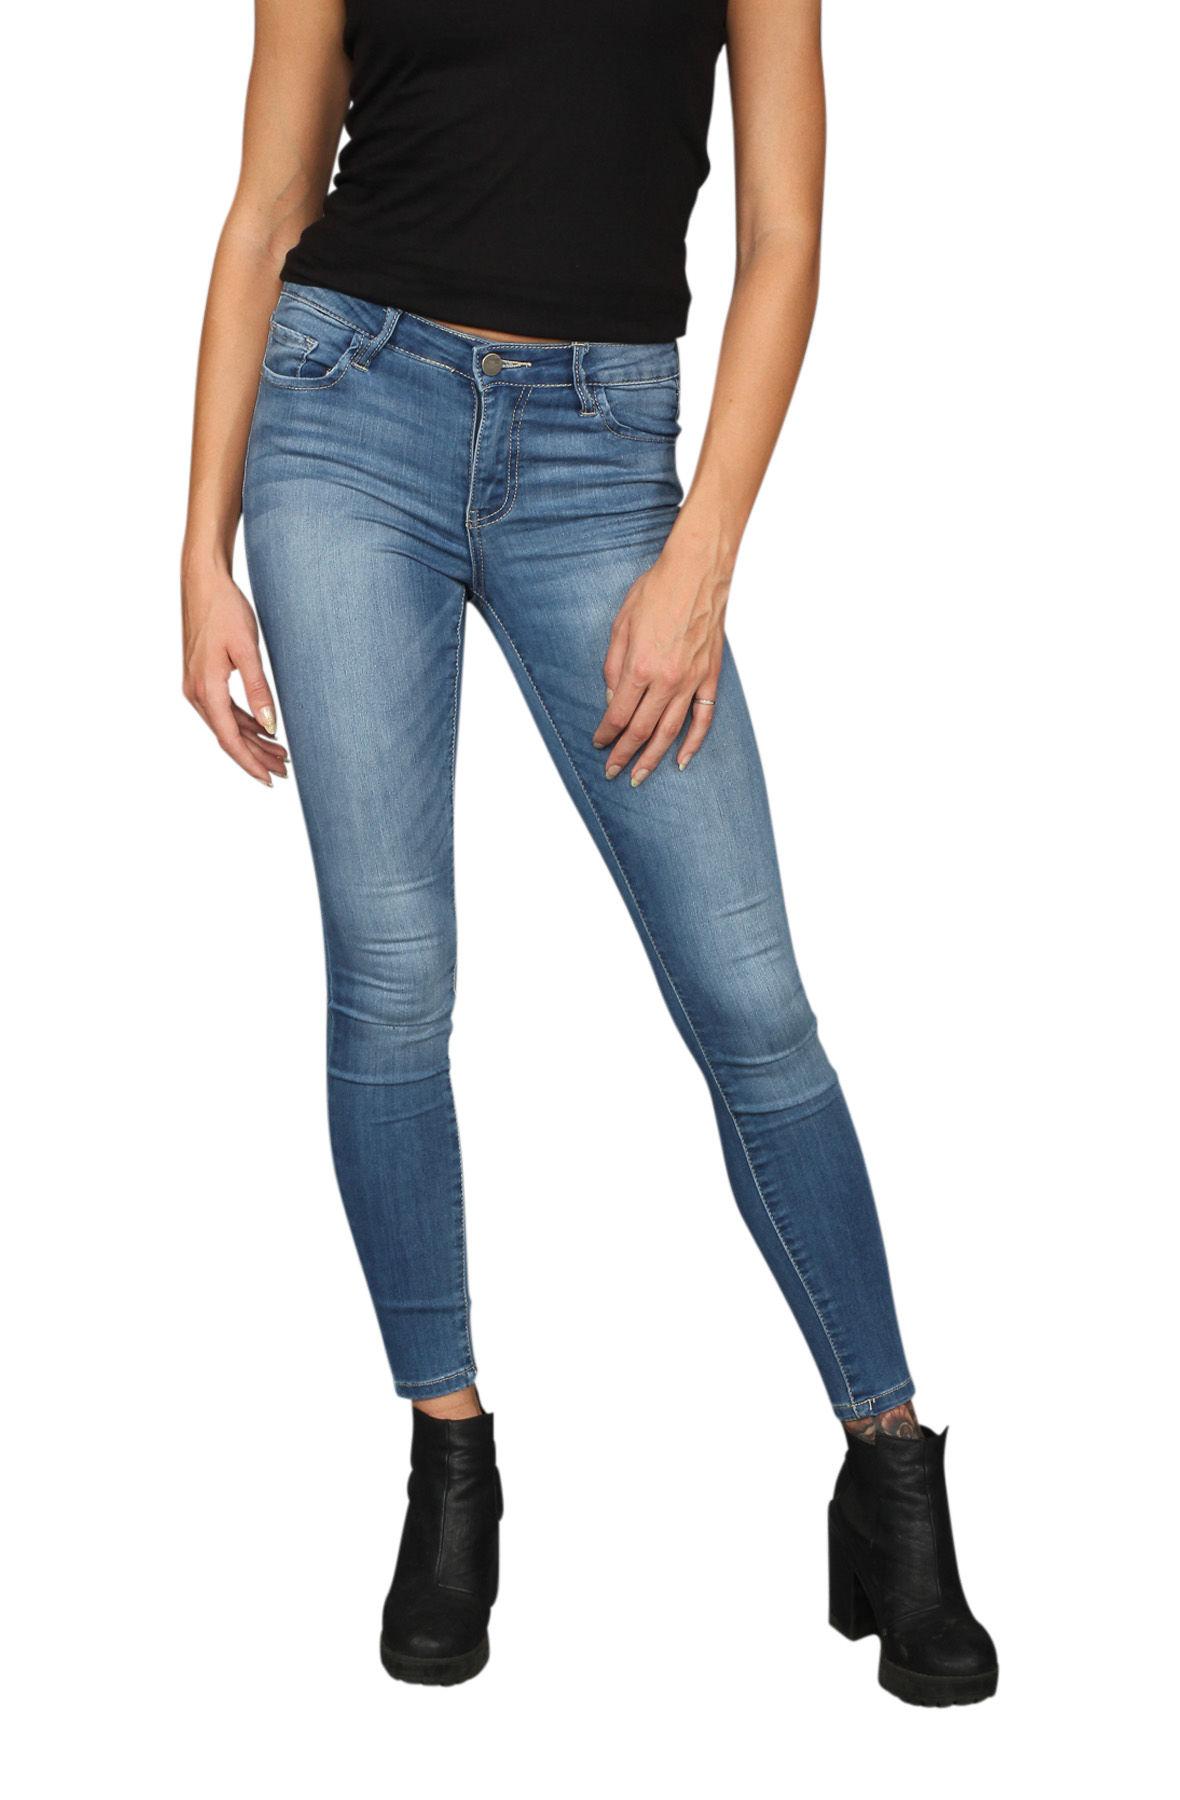 Image of Medium Denim Skinny Jeans